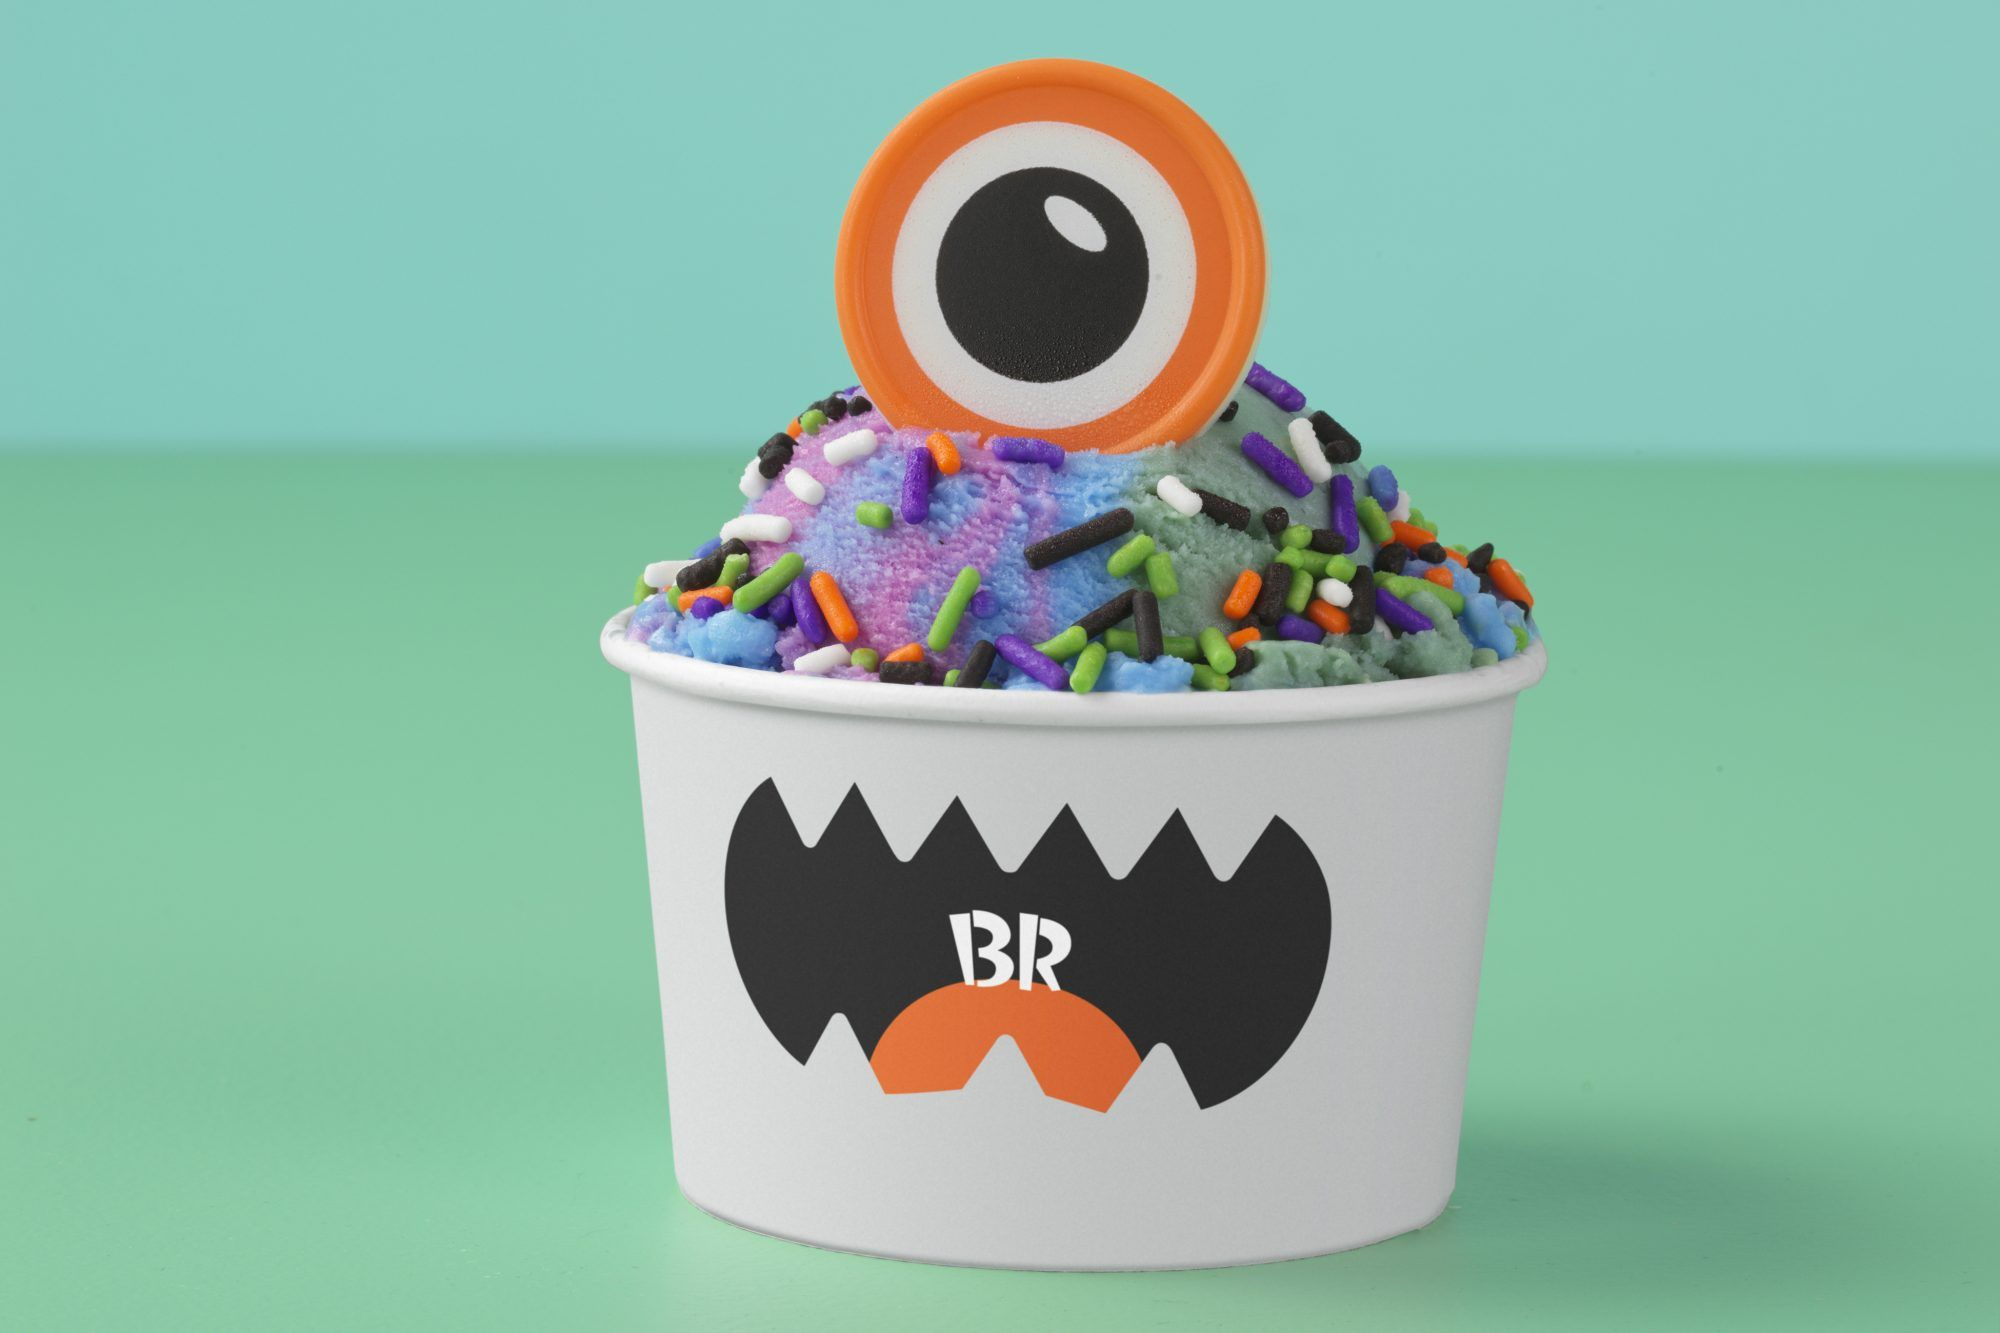 BaskinRobbins Celebrates National Ice Cream Month With